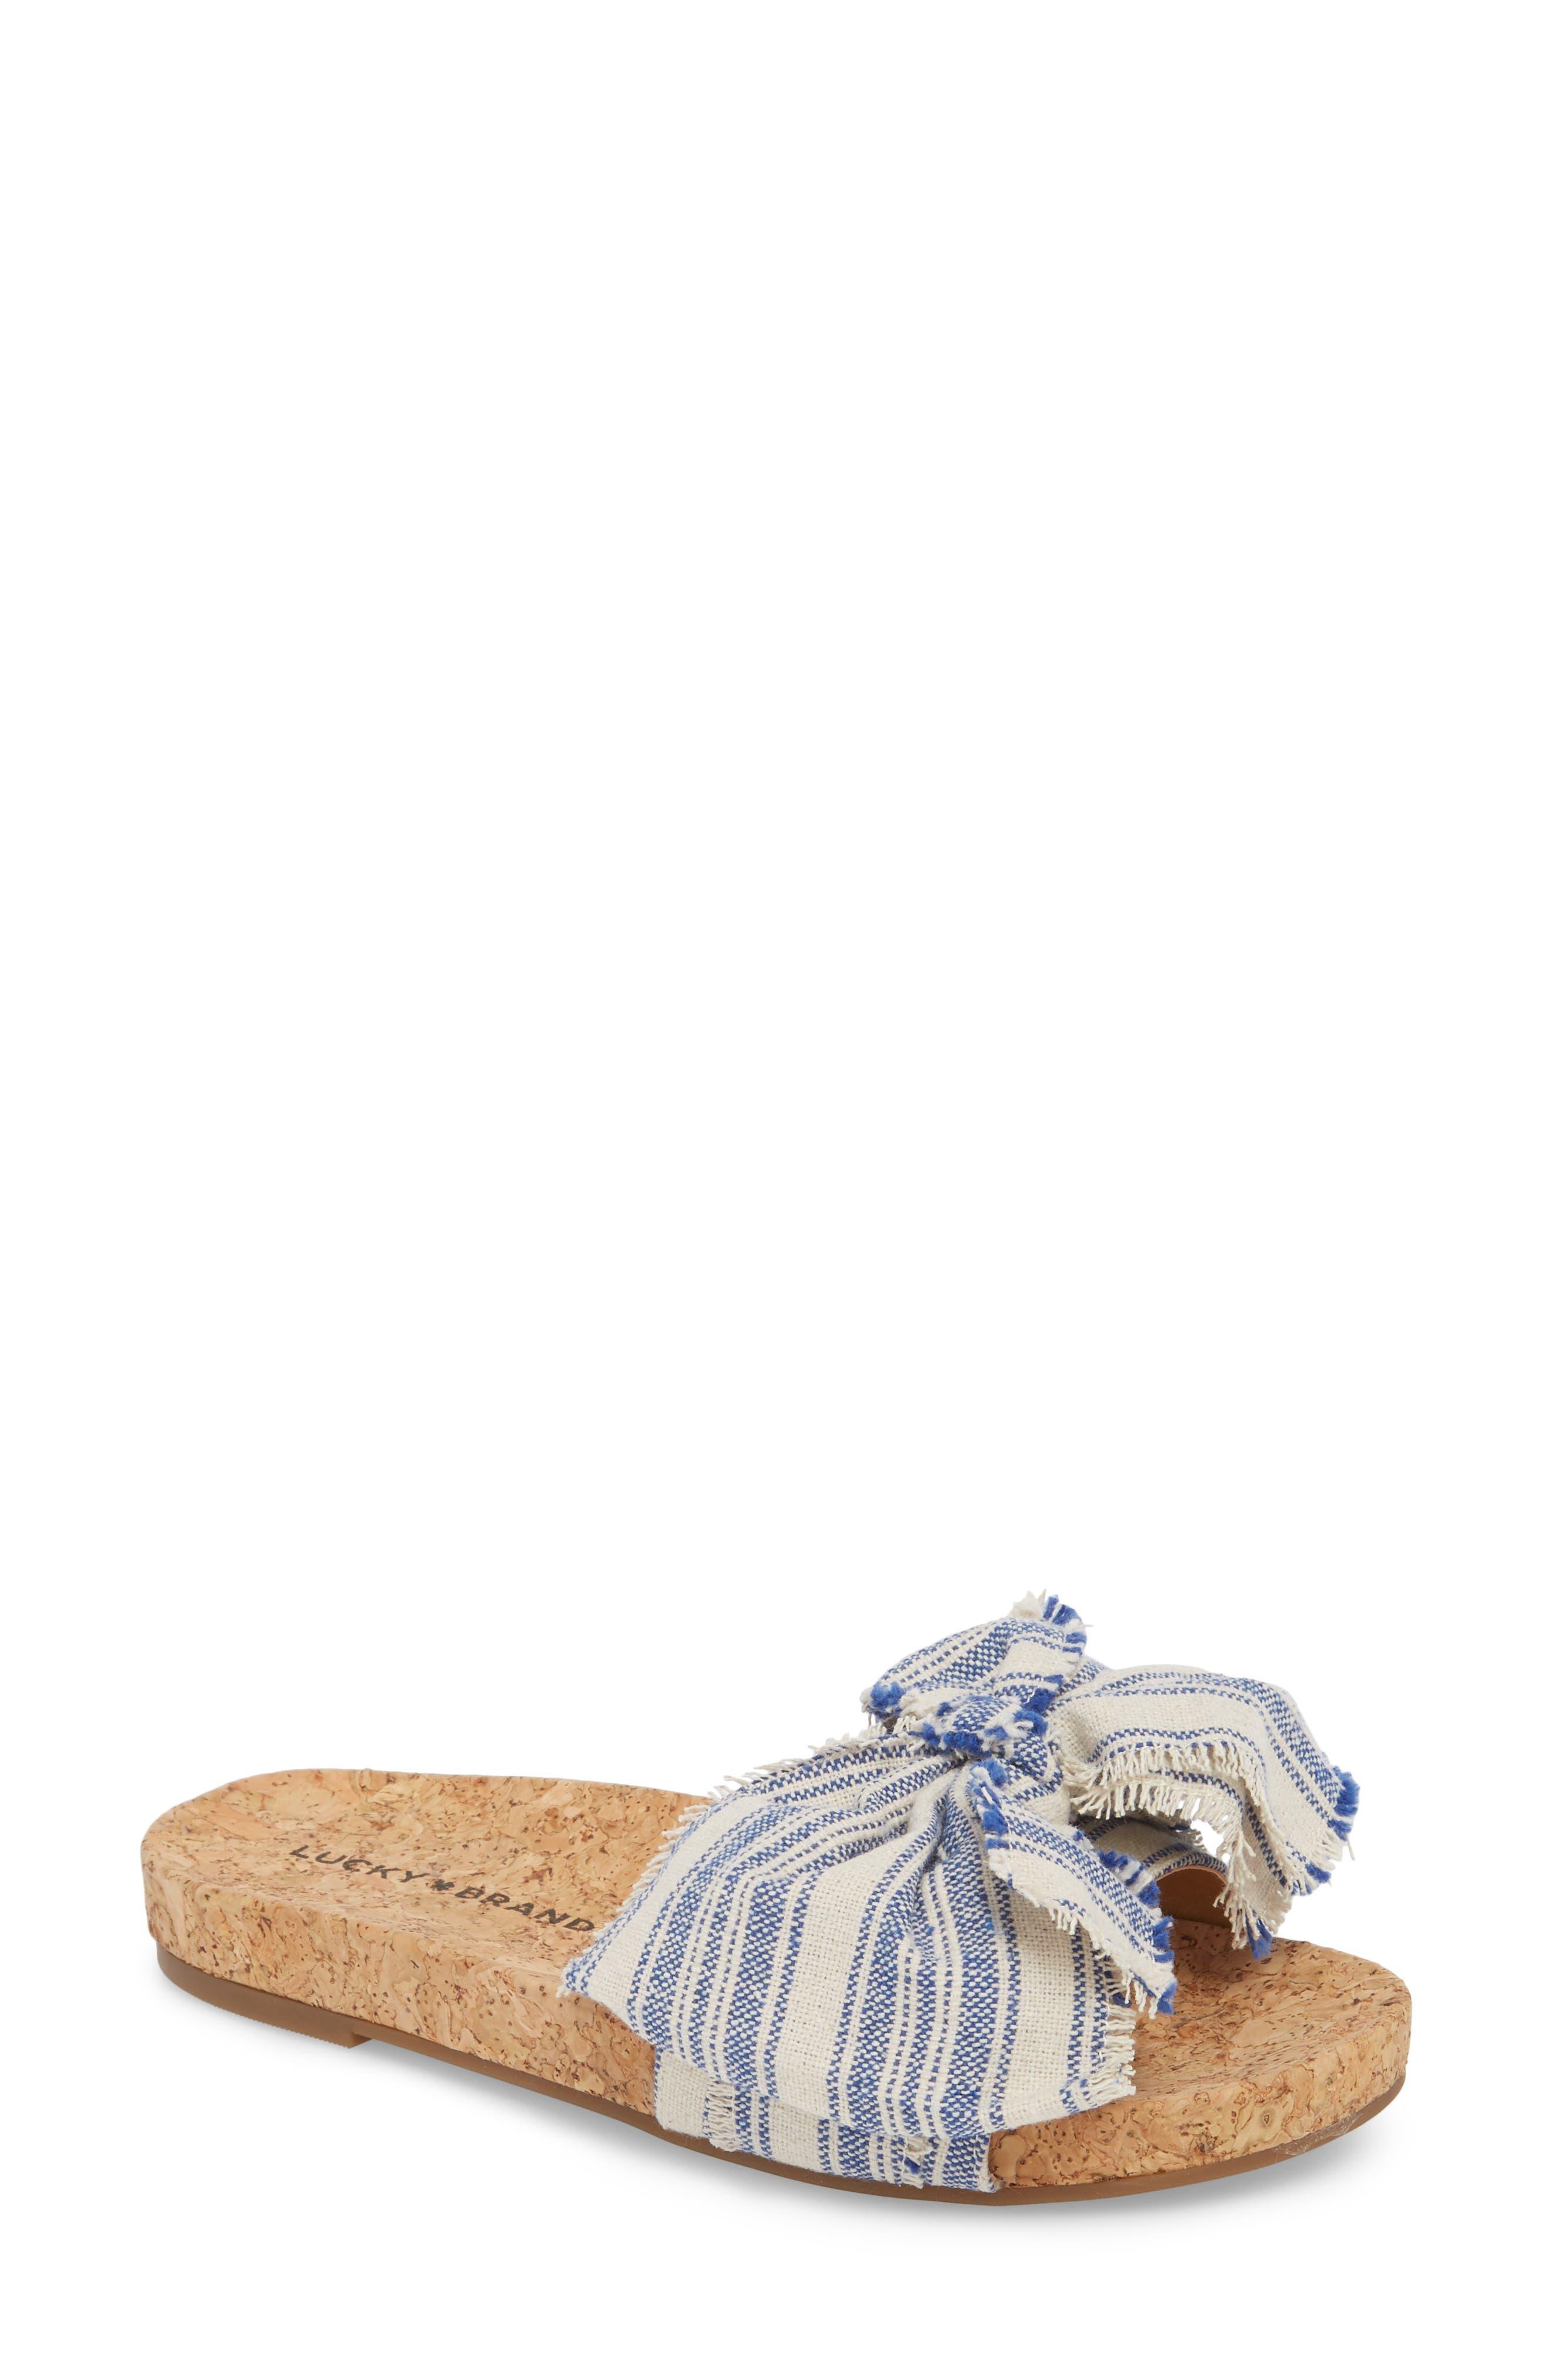 Floella Bow Slide Sandal,                             Main thumbnail 1, color,                             Lapis Leather